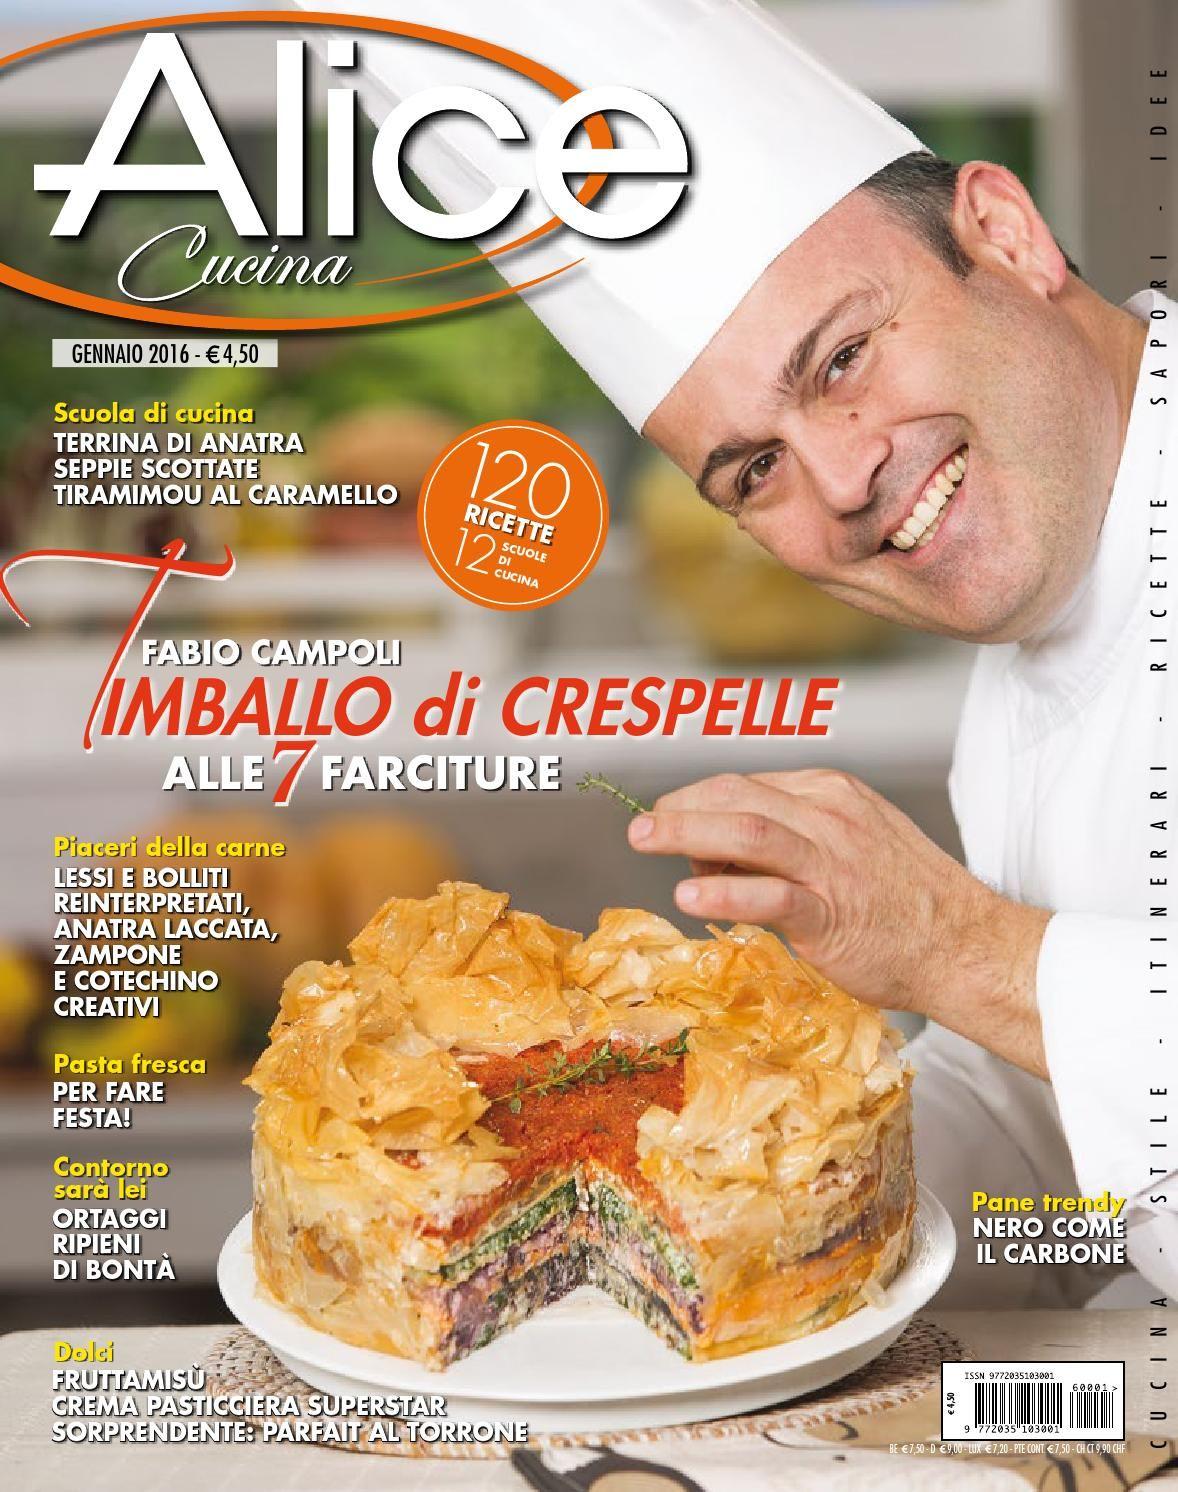 Alice cucina 01 2016 mar libri di cucina ricette for Alice cucina ricette